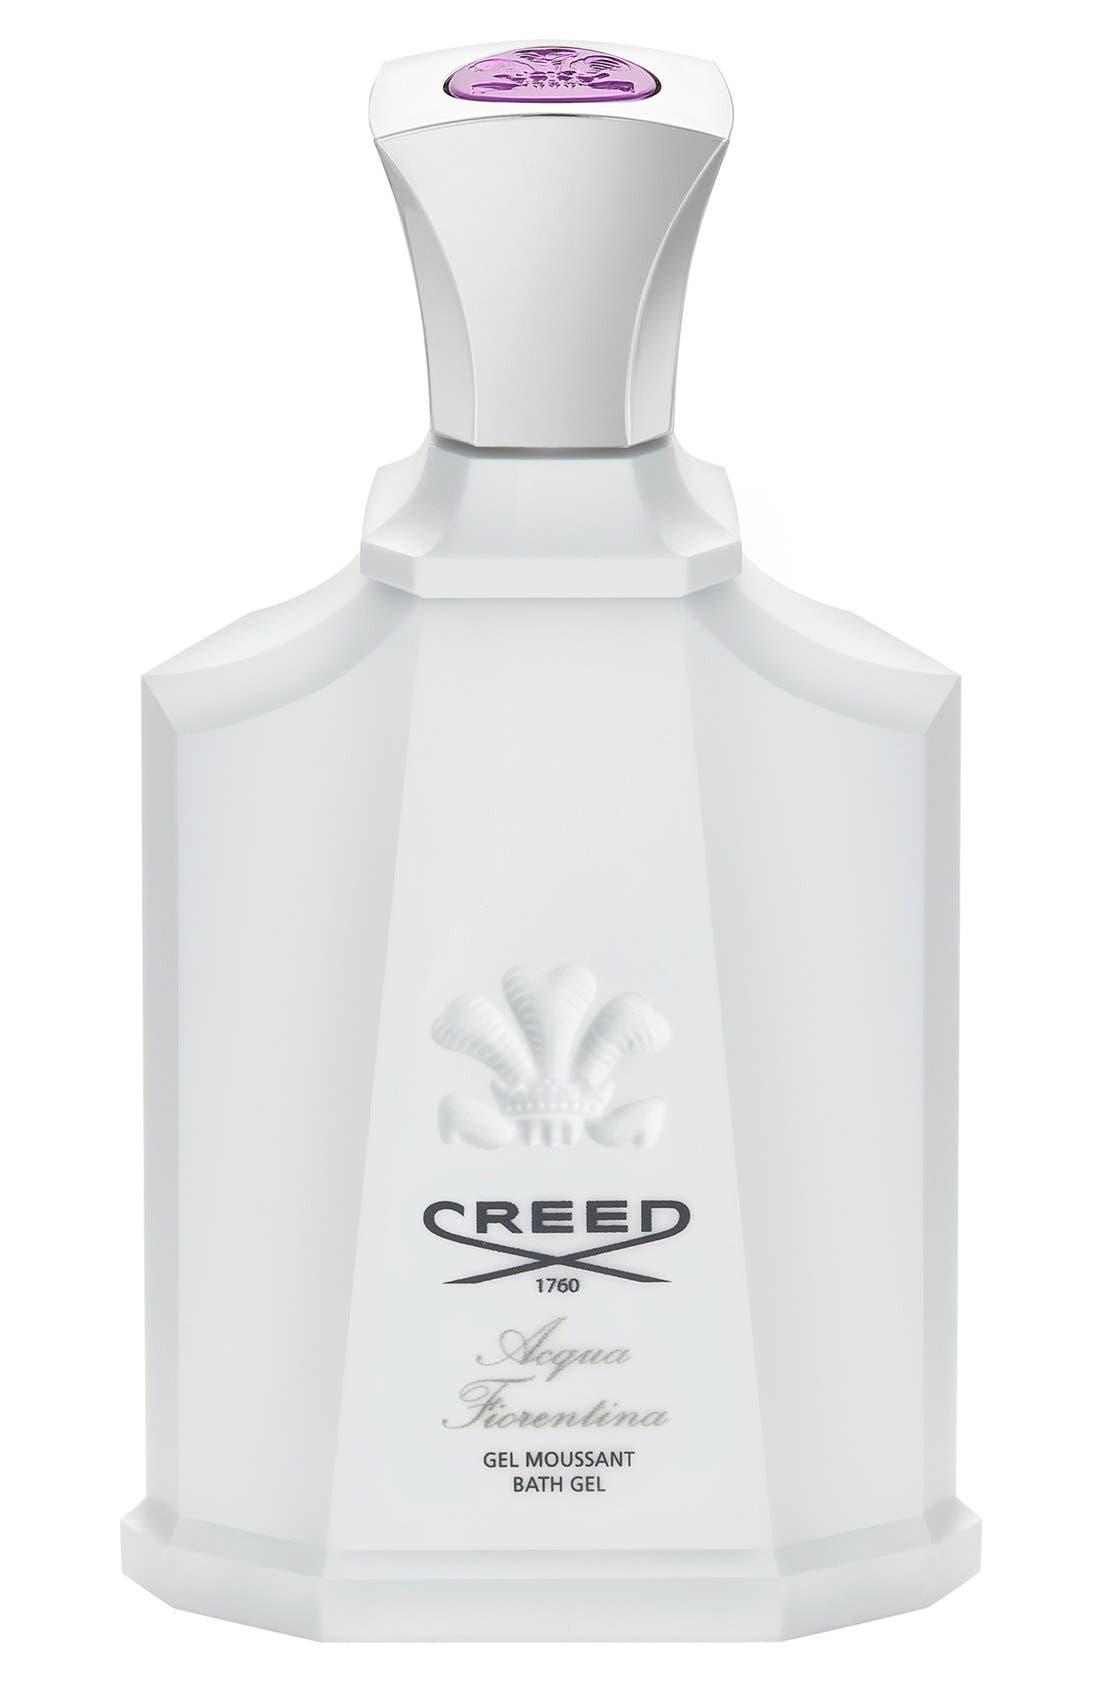 Creed 'Acqua Fiorentina' Shower Gel